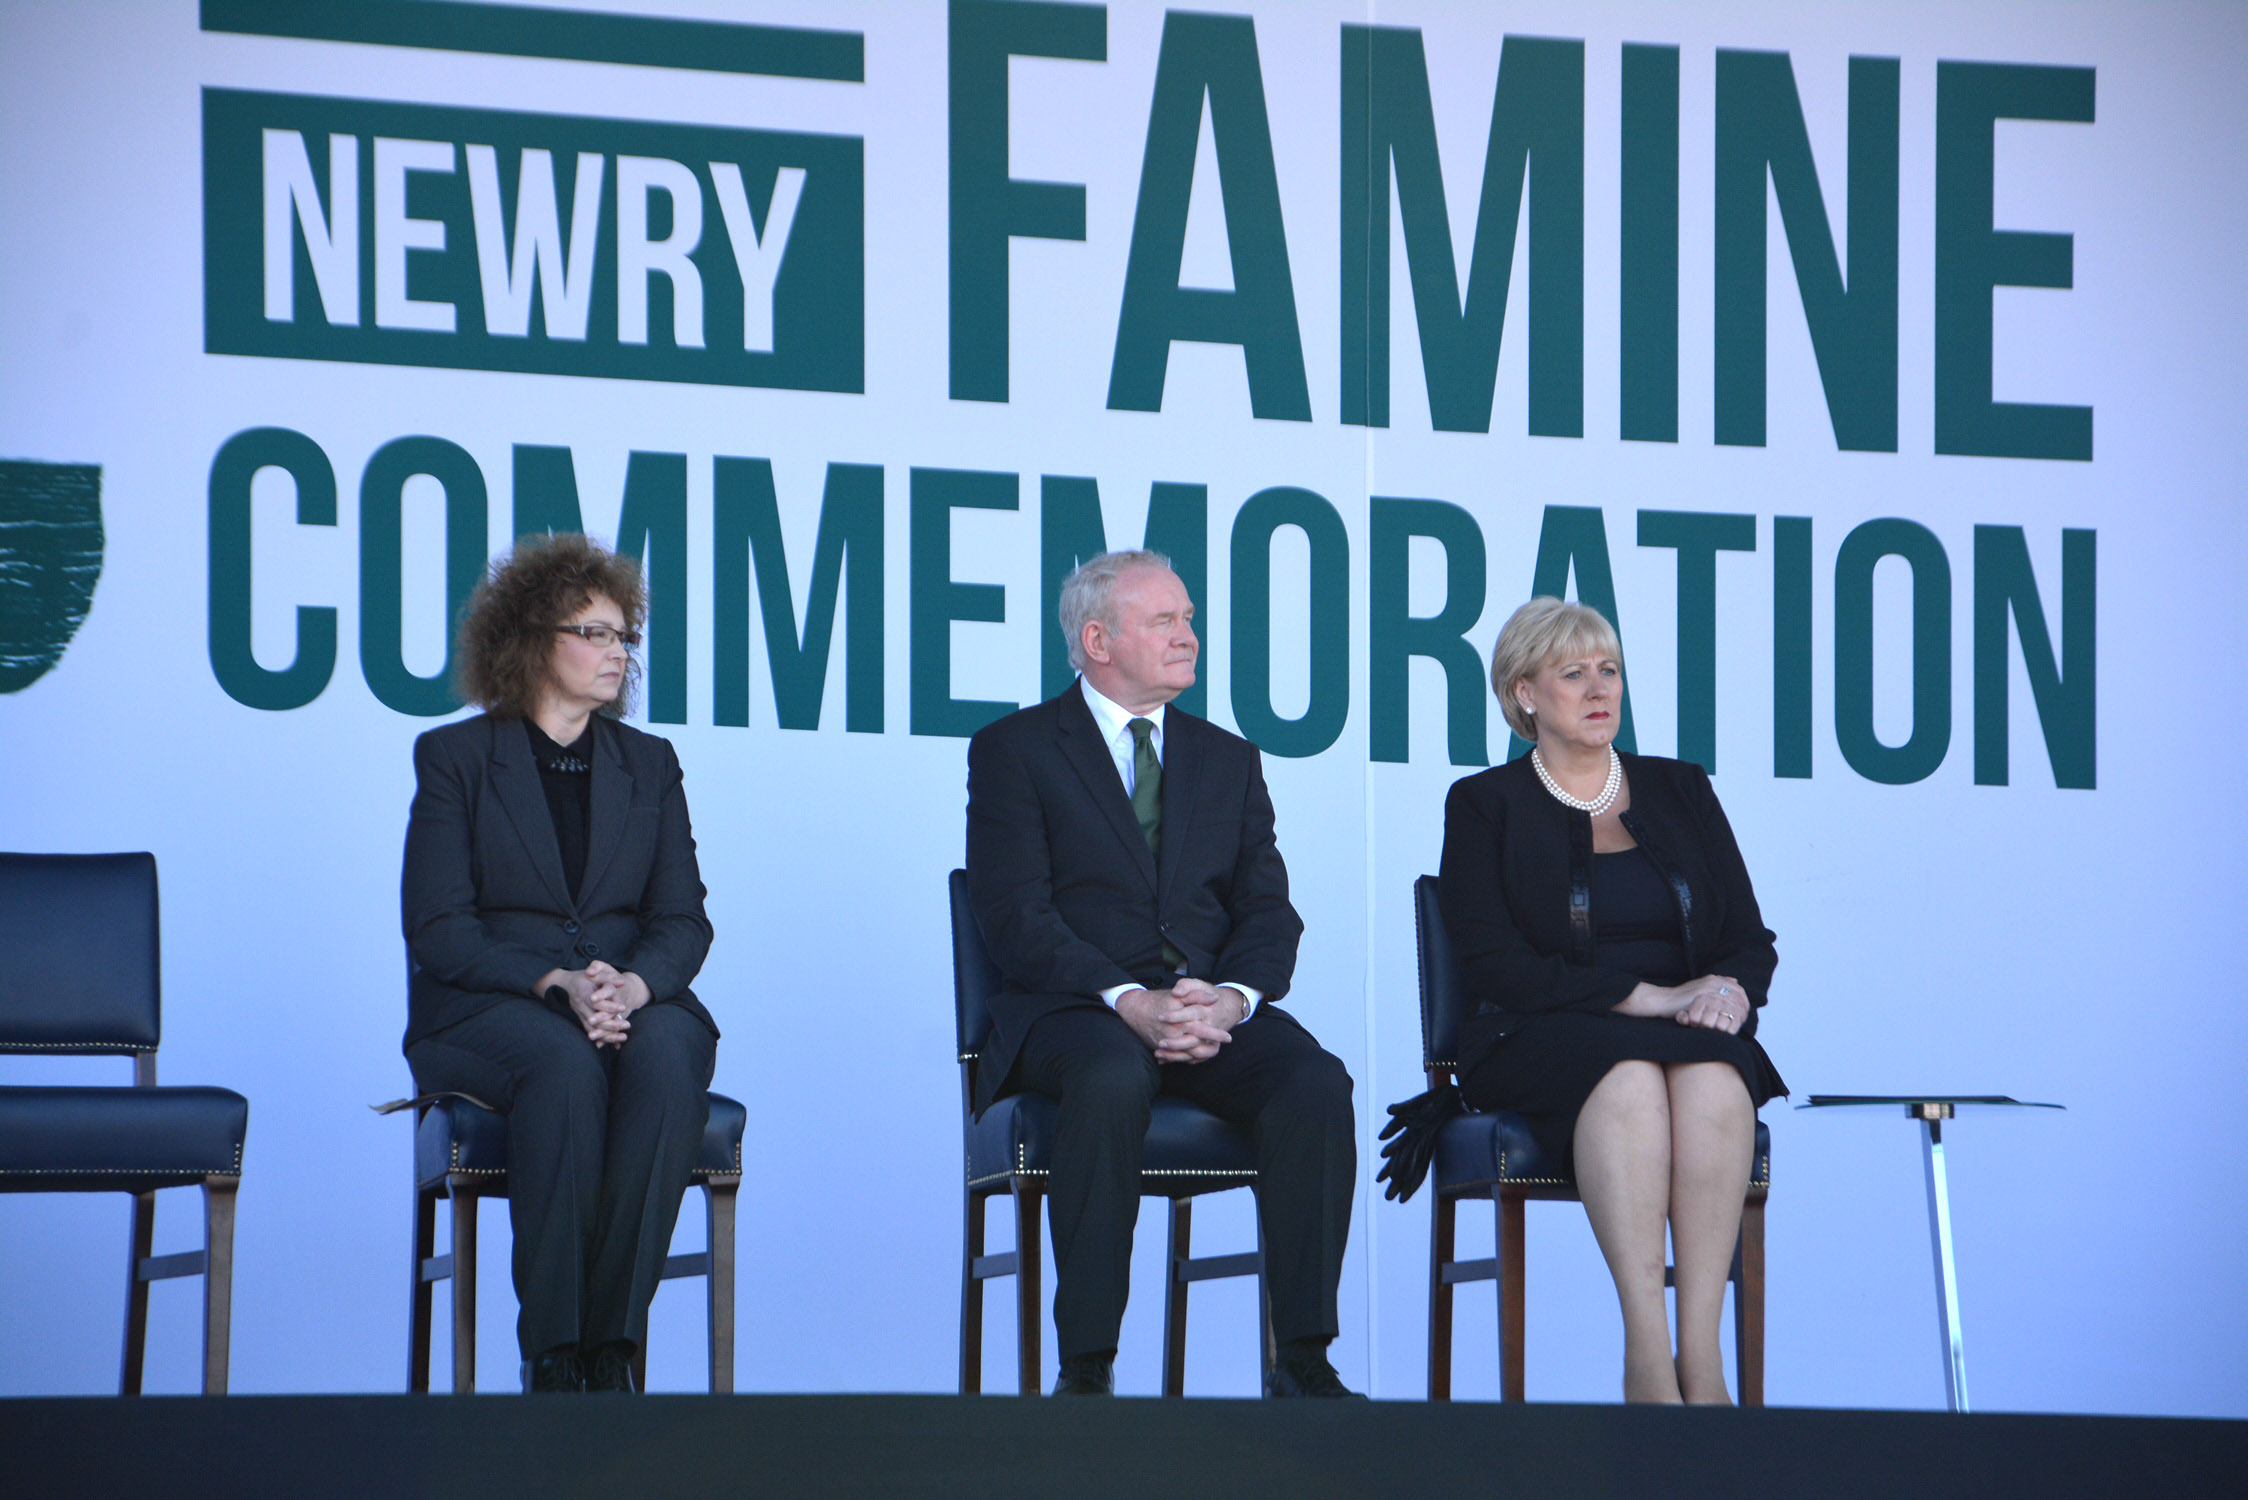 Martin-attending-famine-event-newry-26-sep-2015